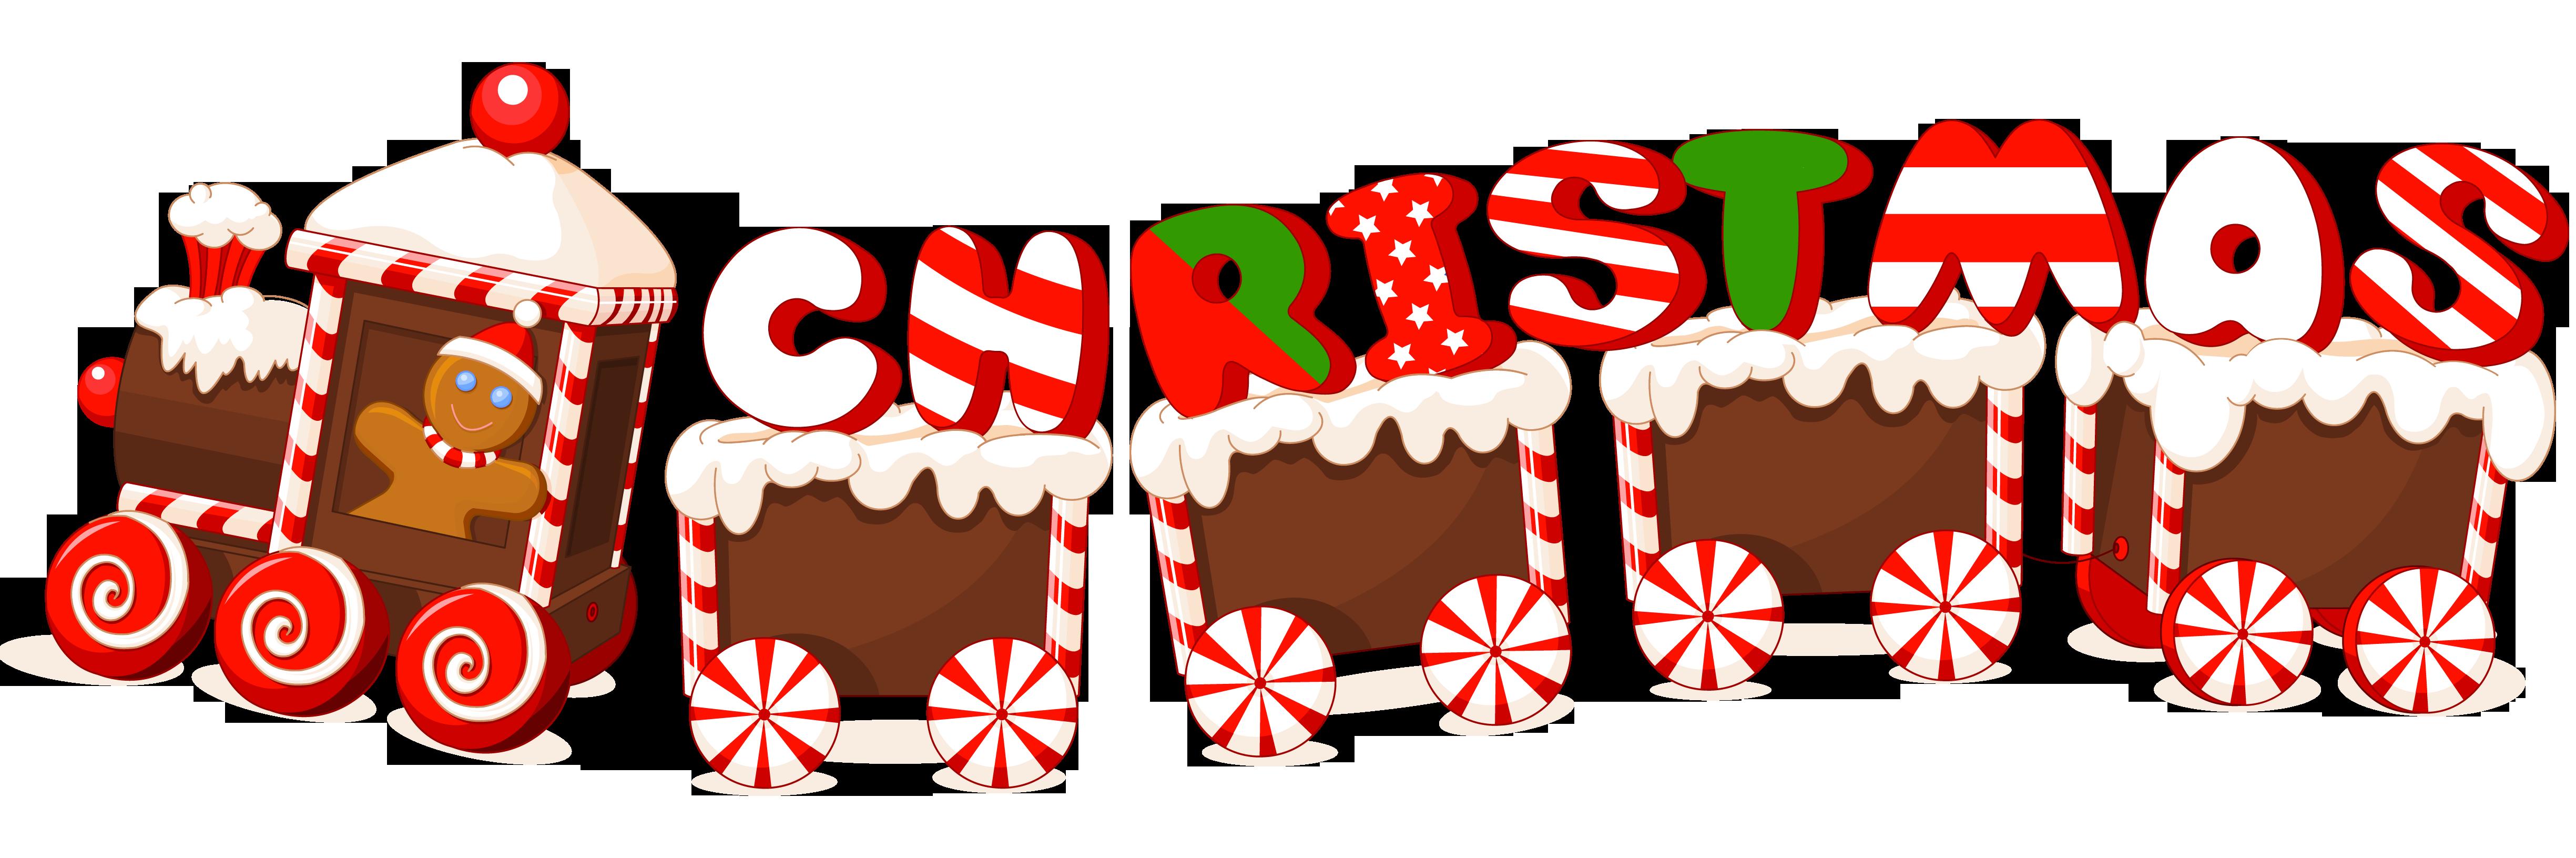 16 Merry Christmas Clipart